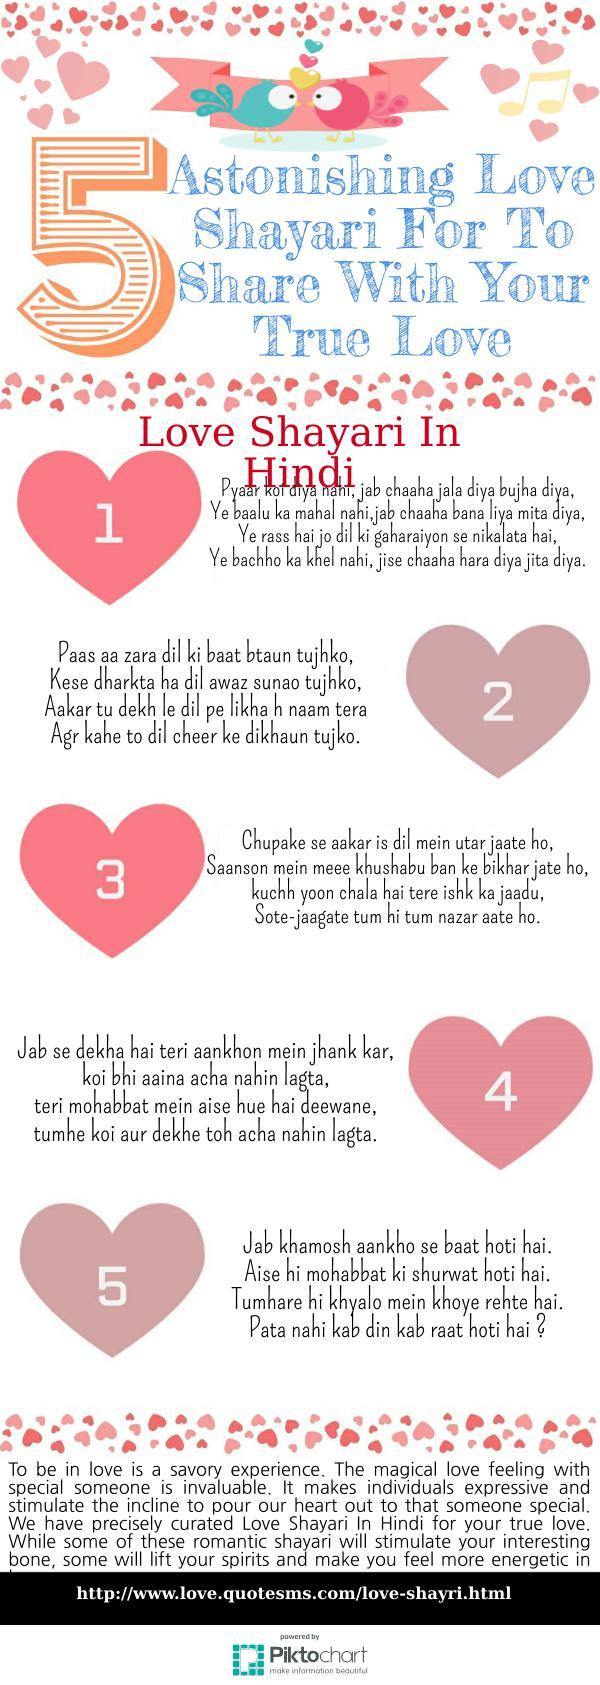 5 astonishing love shayari for to share with your true love